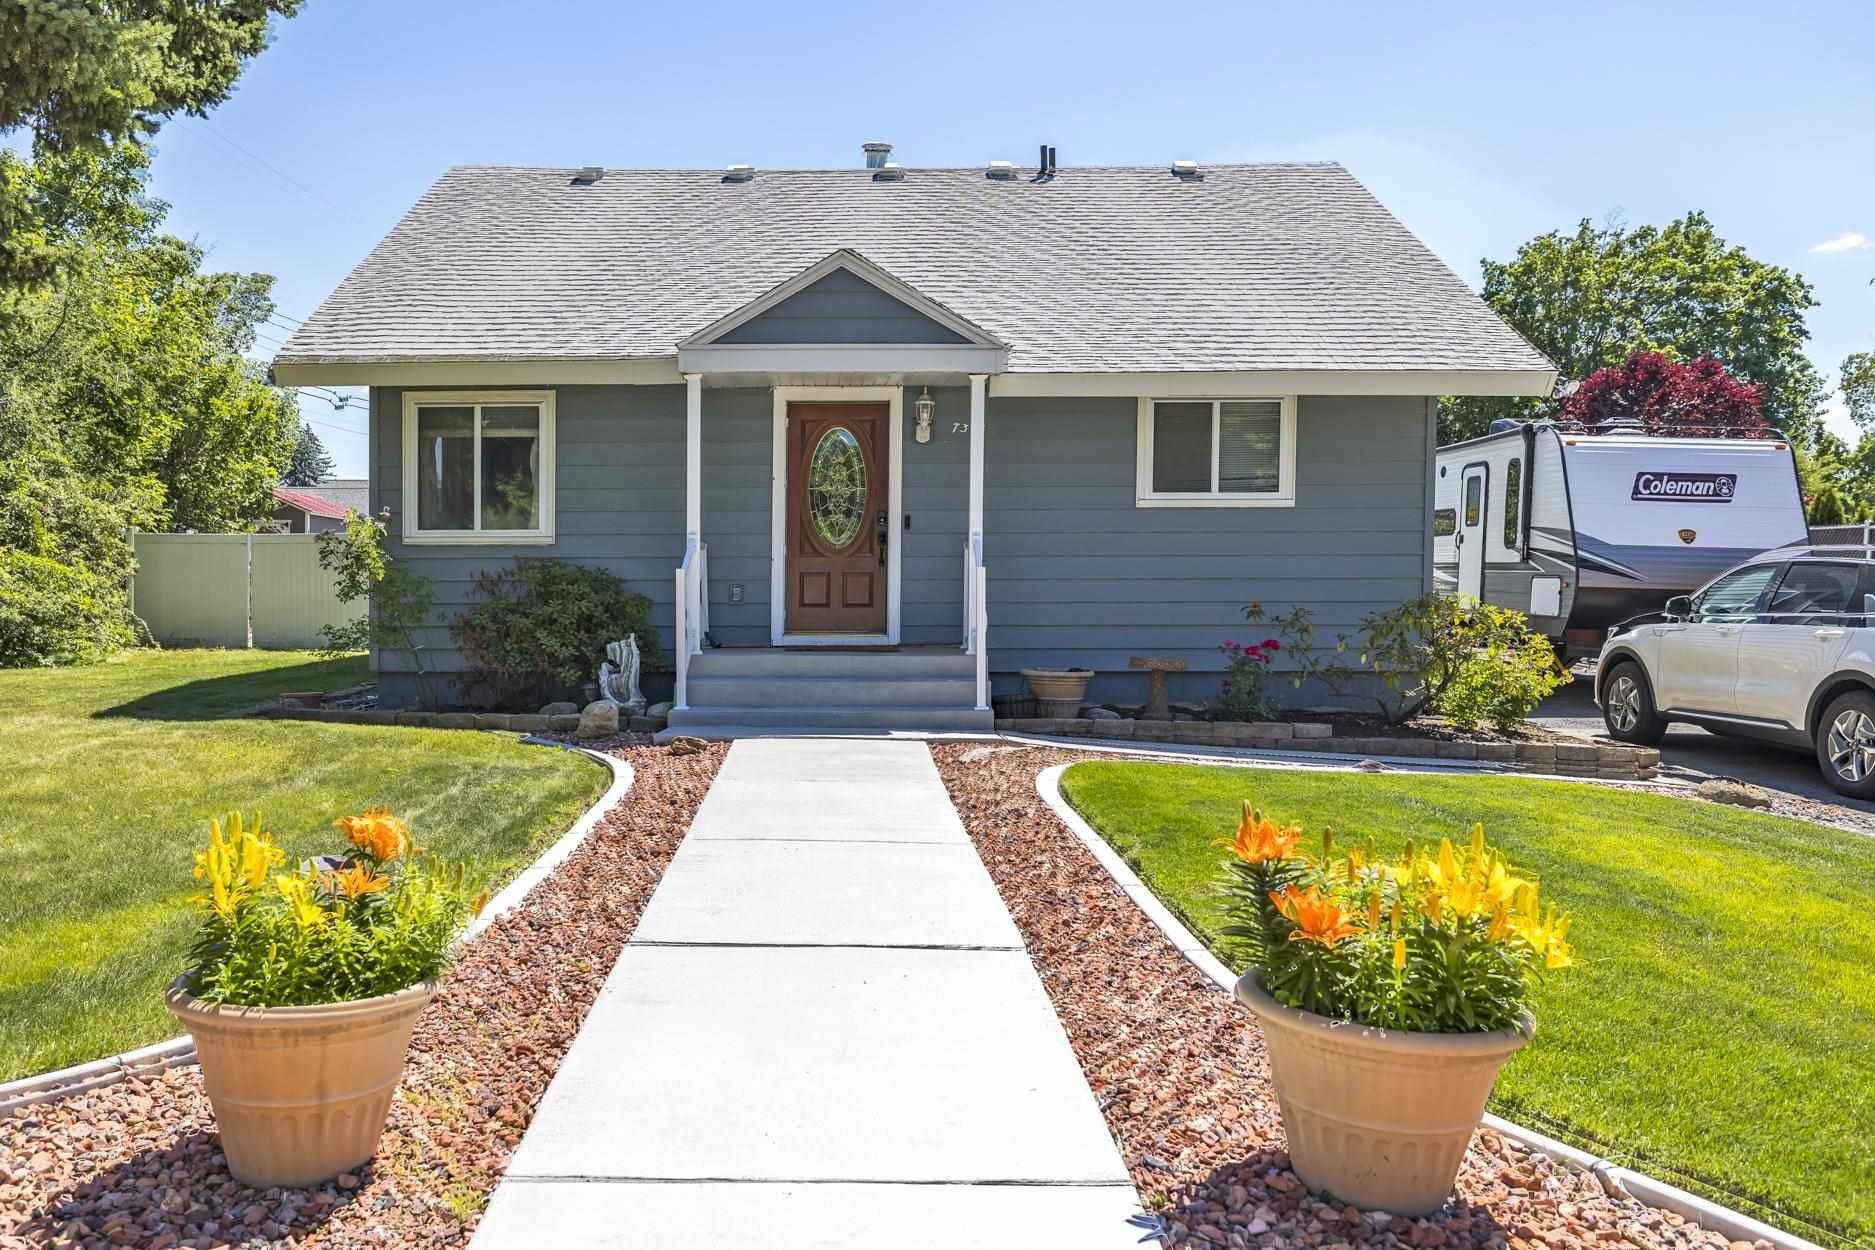 7312 E Euclid St, Spokane Valley, WA 99212 - #: 202118037